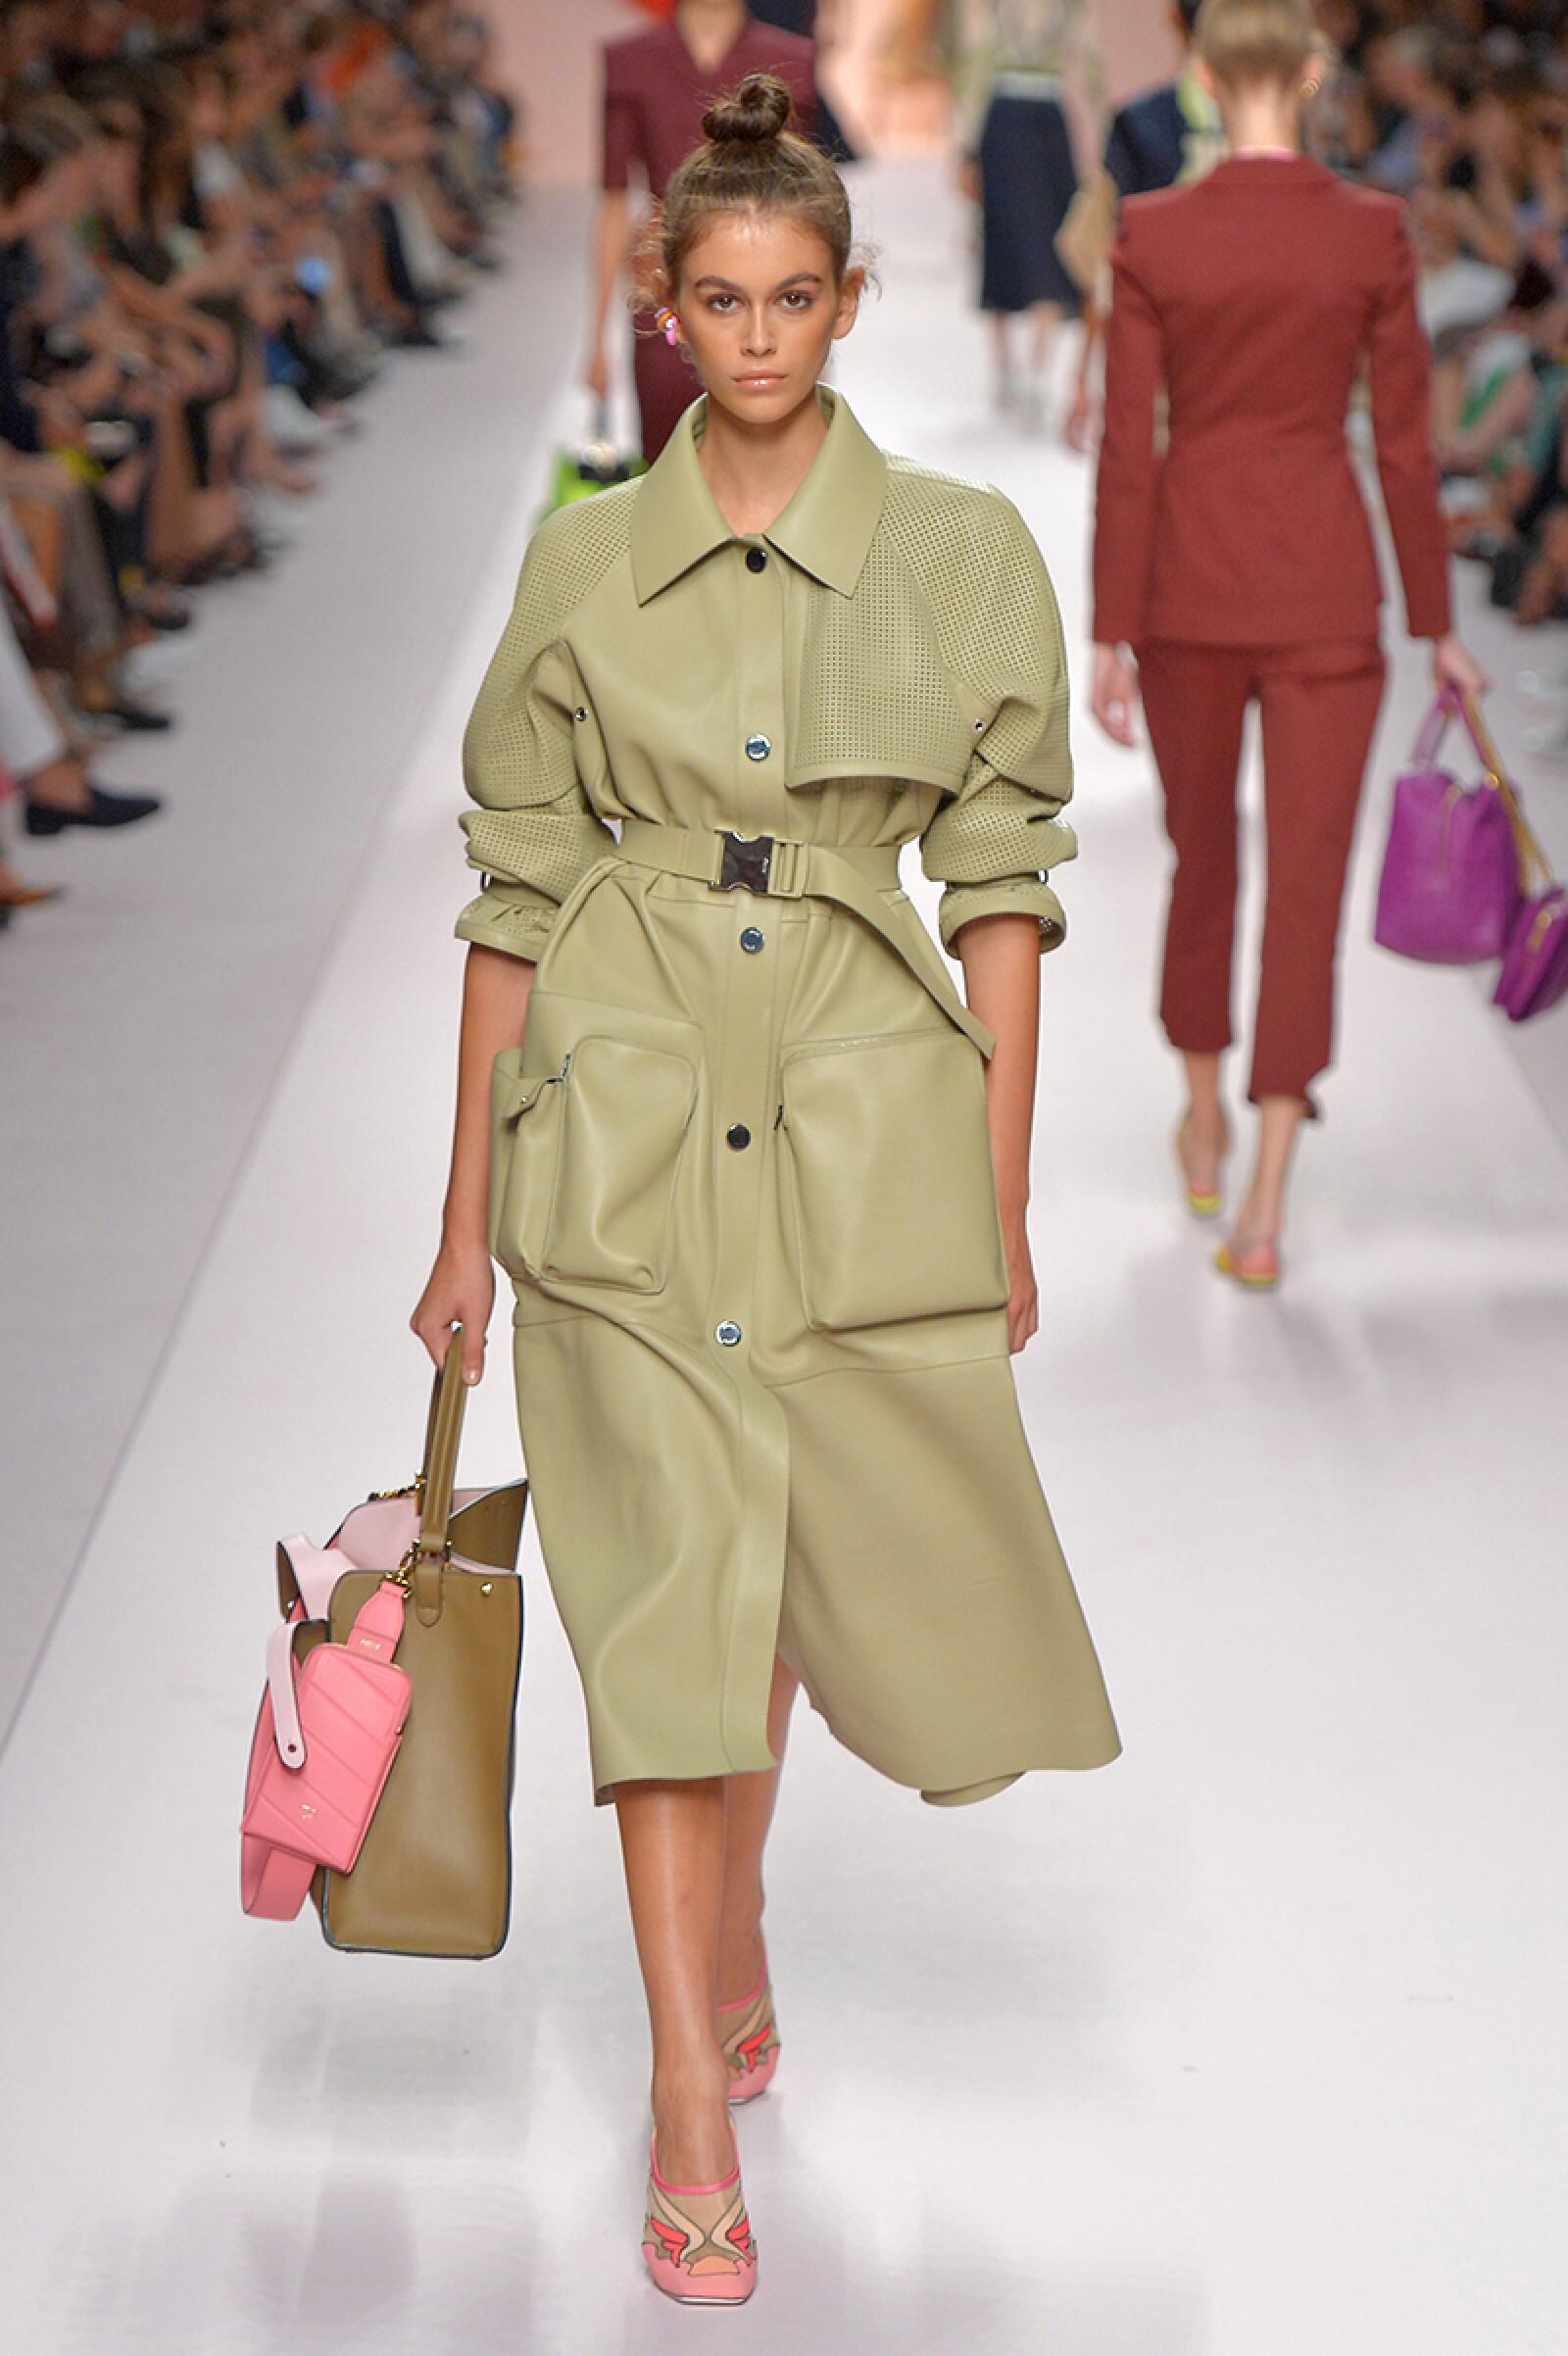 Fendi show, Runway, Spring Summer 2019, Milan Fashion Week, Italy - 20 Sep 2018